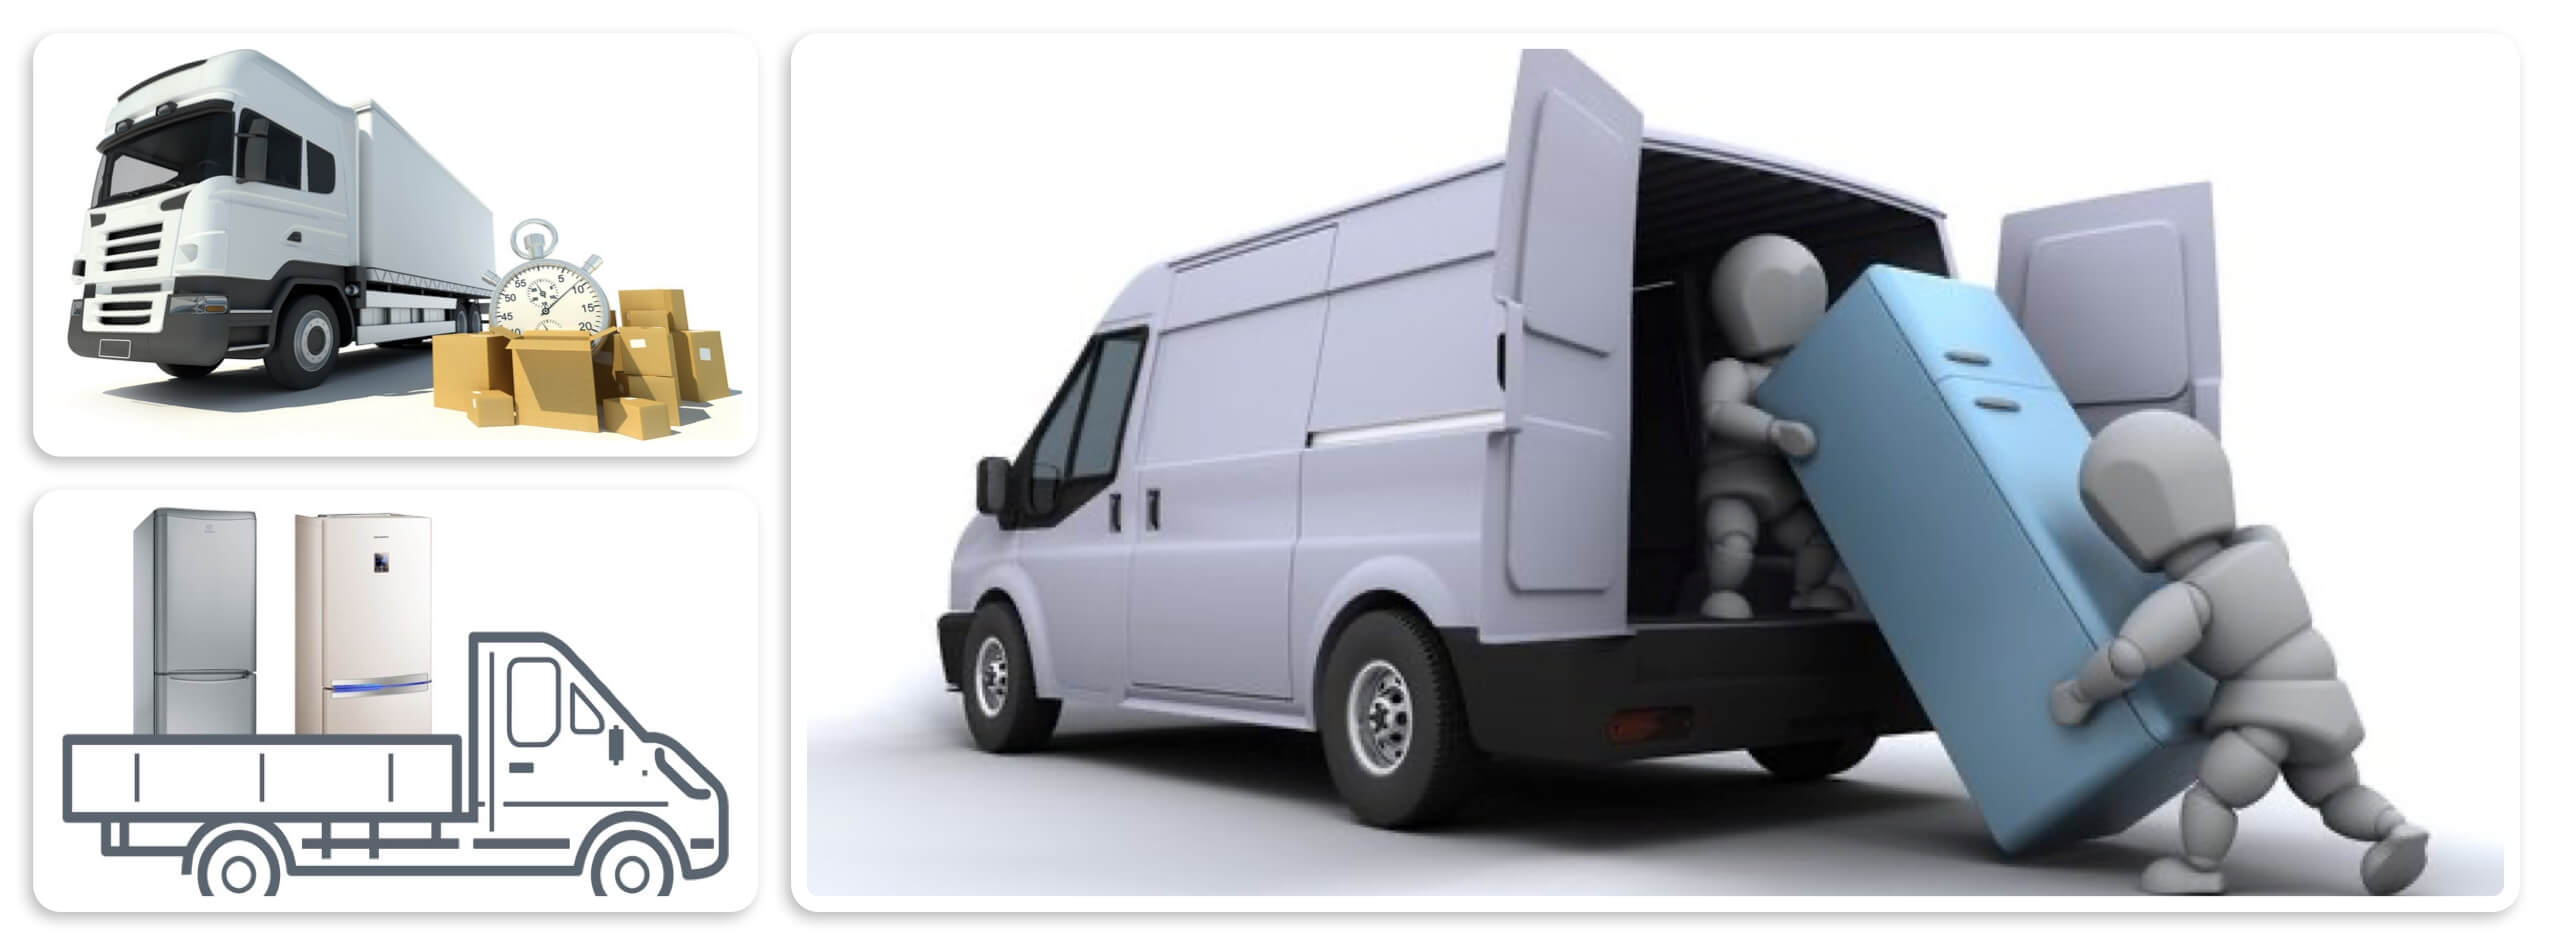 dostavka_hitachi_free_speed2 Транспортировка холодильника